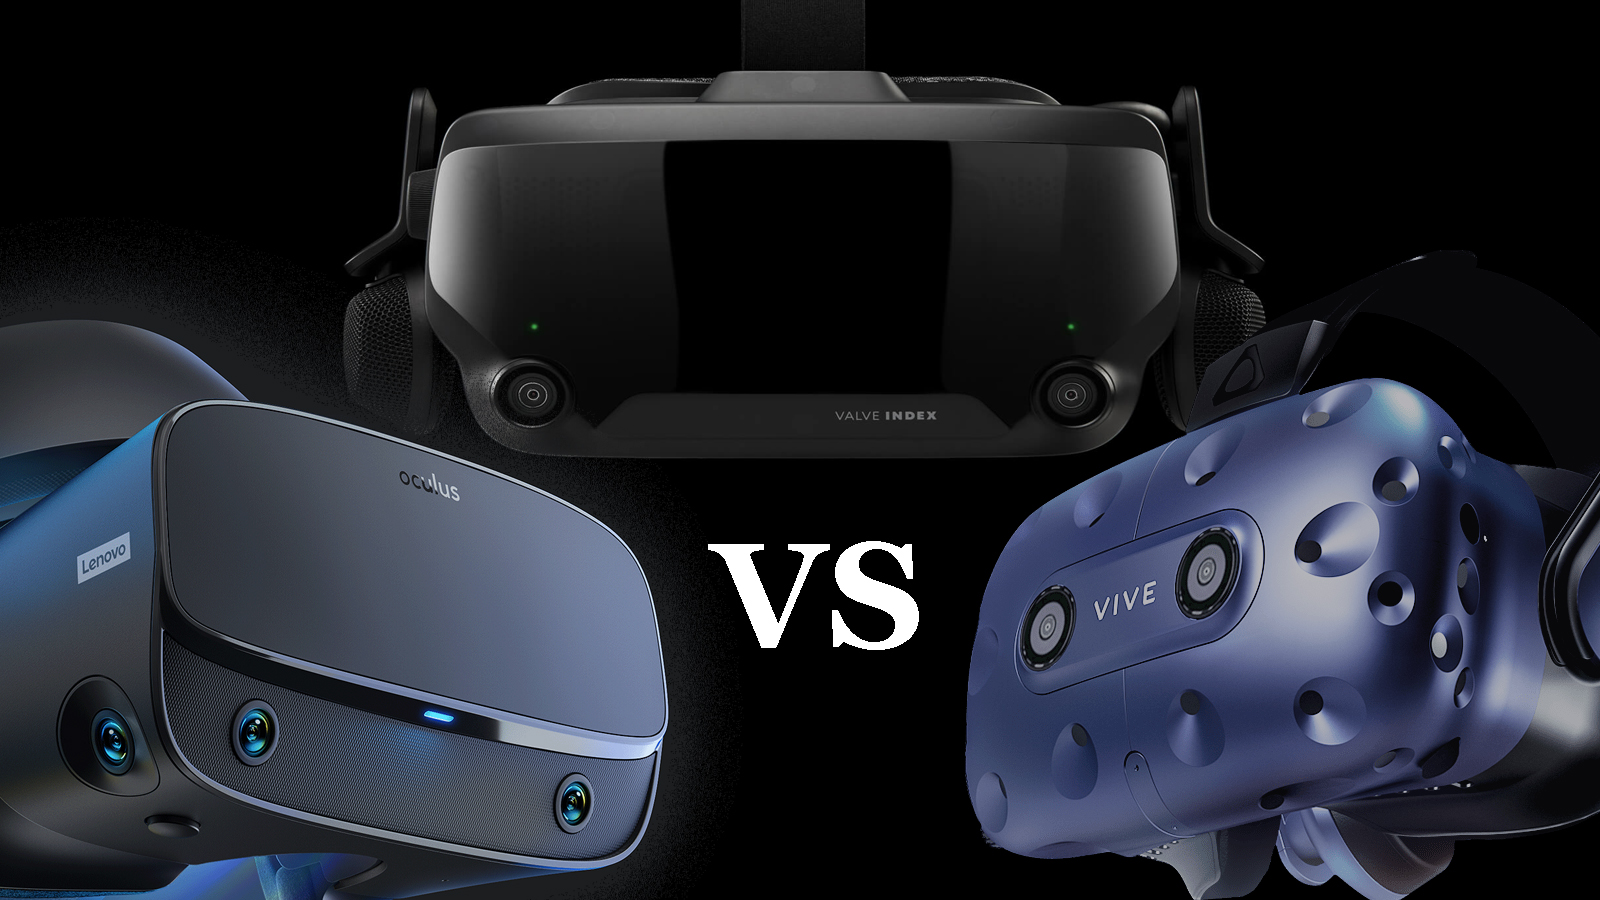 Valve Index vs HTC Vive Pro vs Oculus Rift S: the VR headset